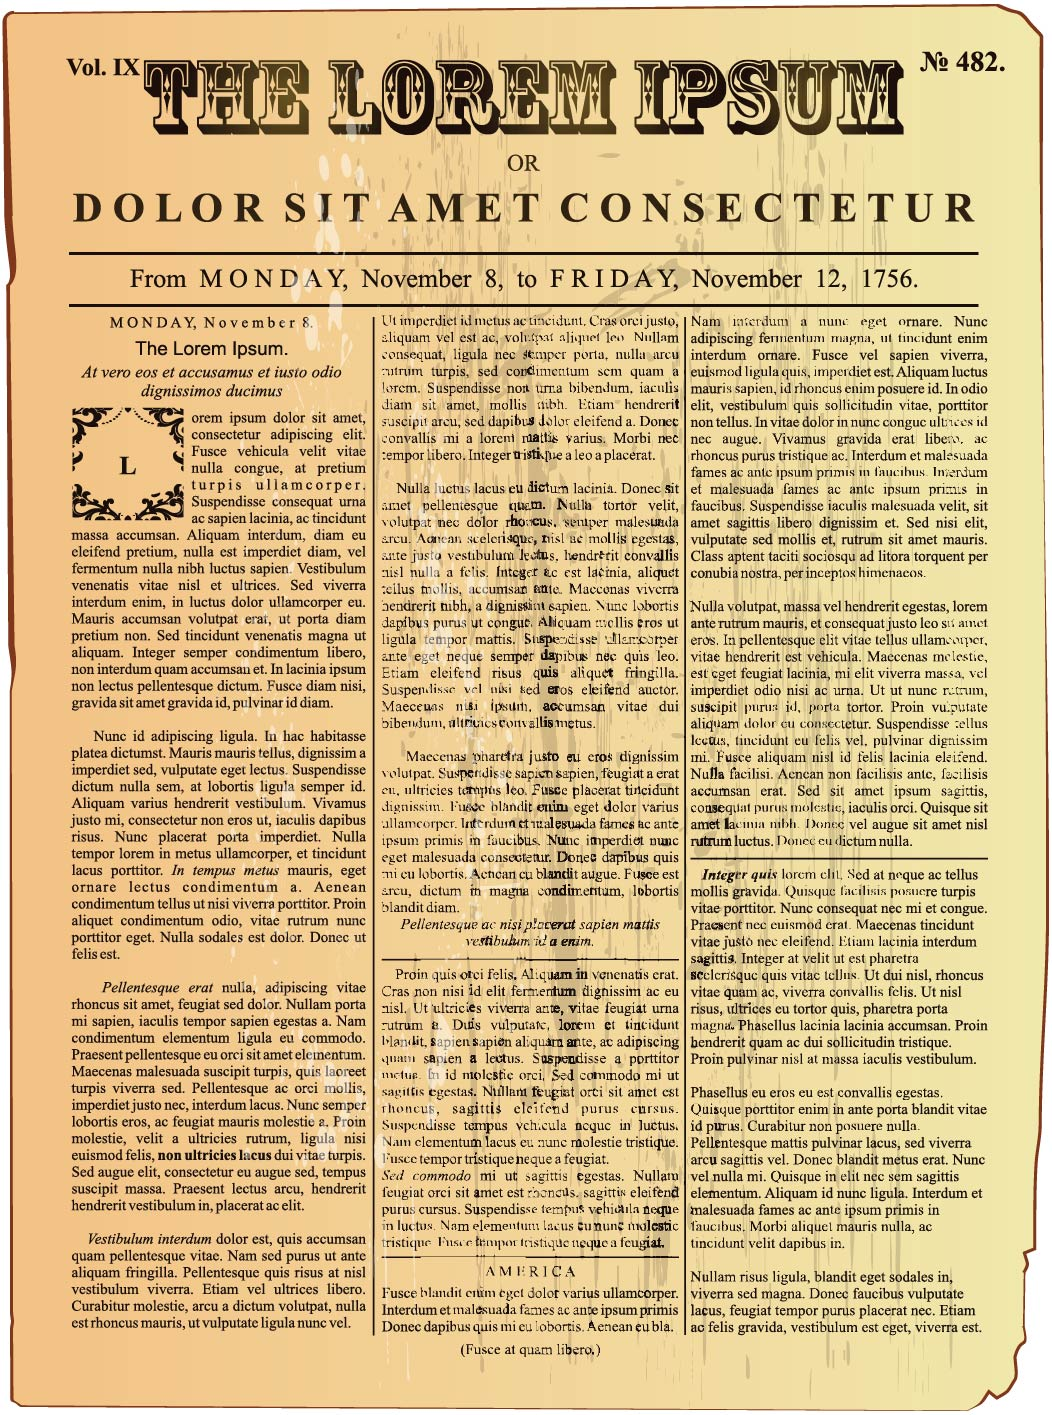 The Lorem Ipsum (a fake vintage newspaper)